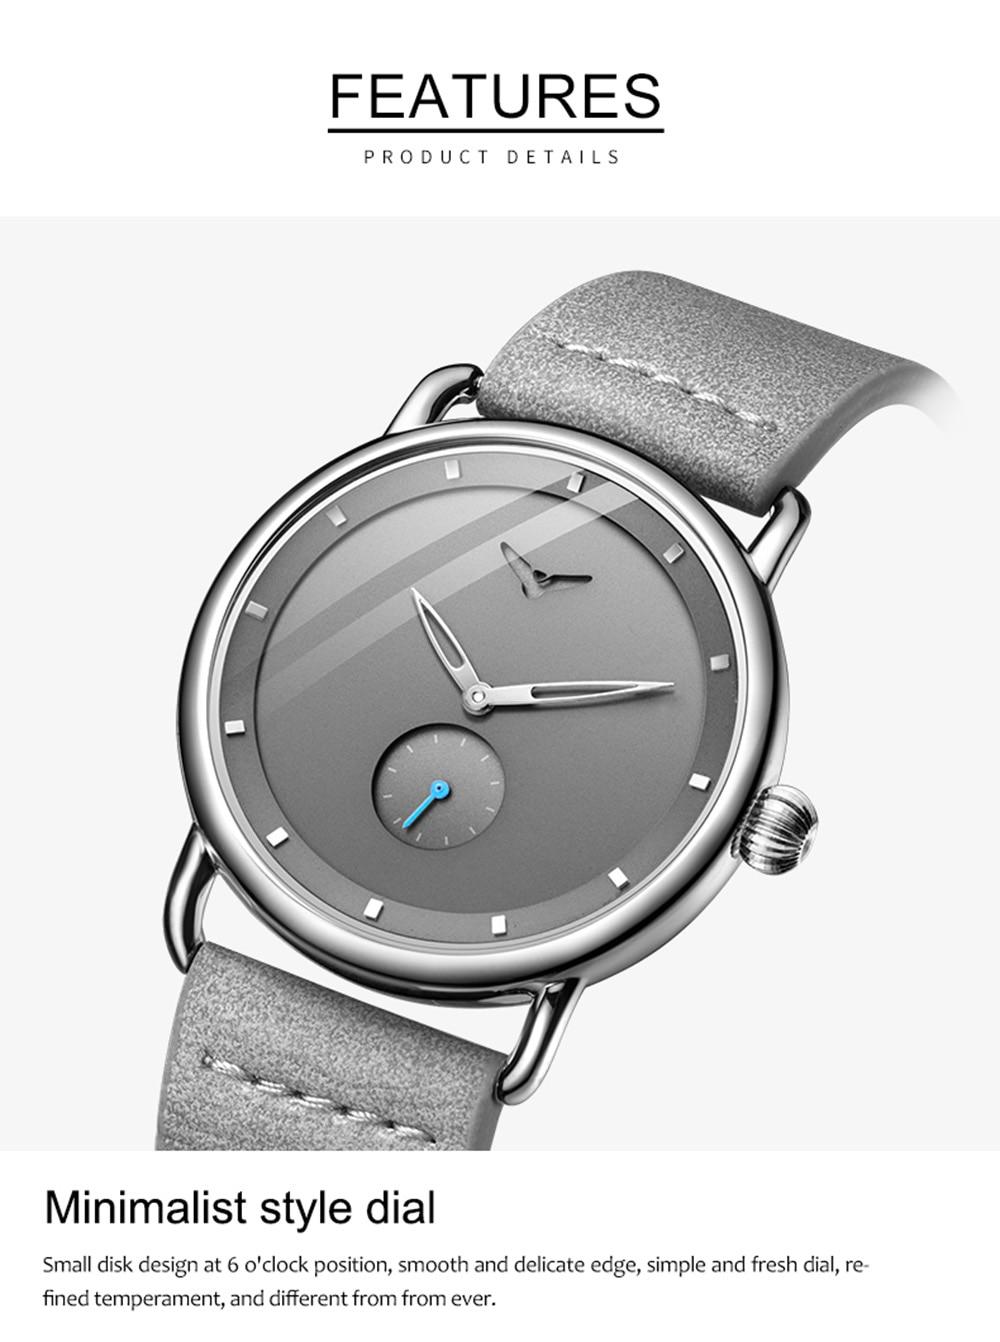 H51c6e3d23d0c4dec9c7ad2cc1291d74f8 ONOLA top brand leather men watches clock fashion sport simple casual waterproof Wrist watch men relogio masculino